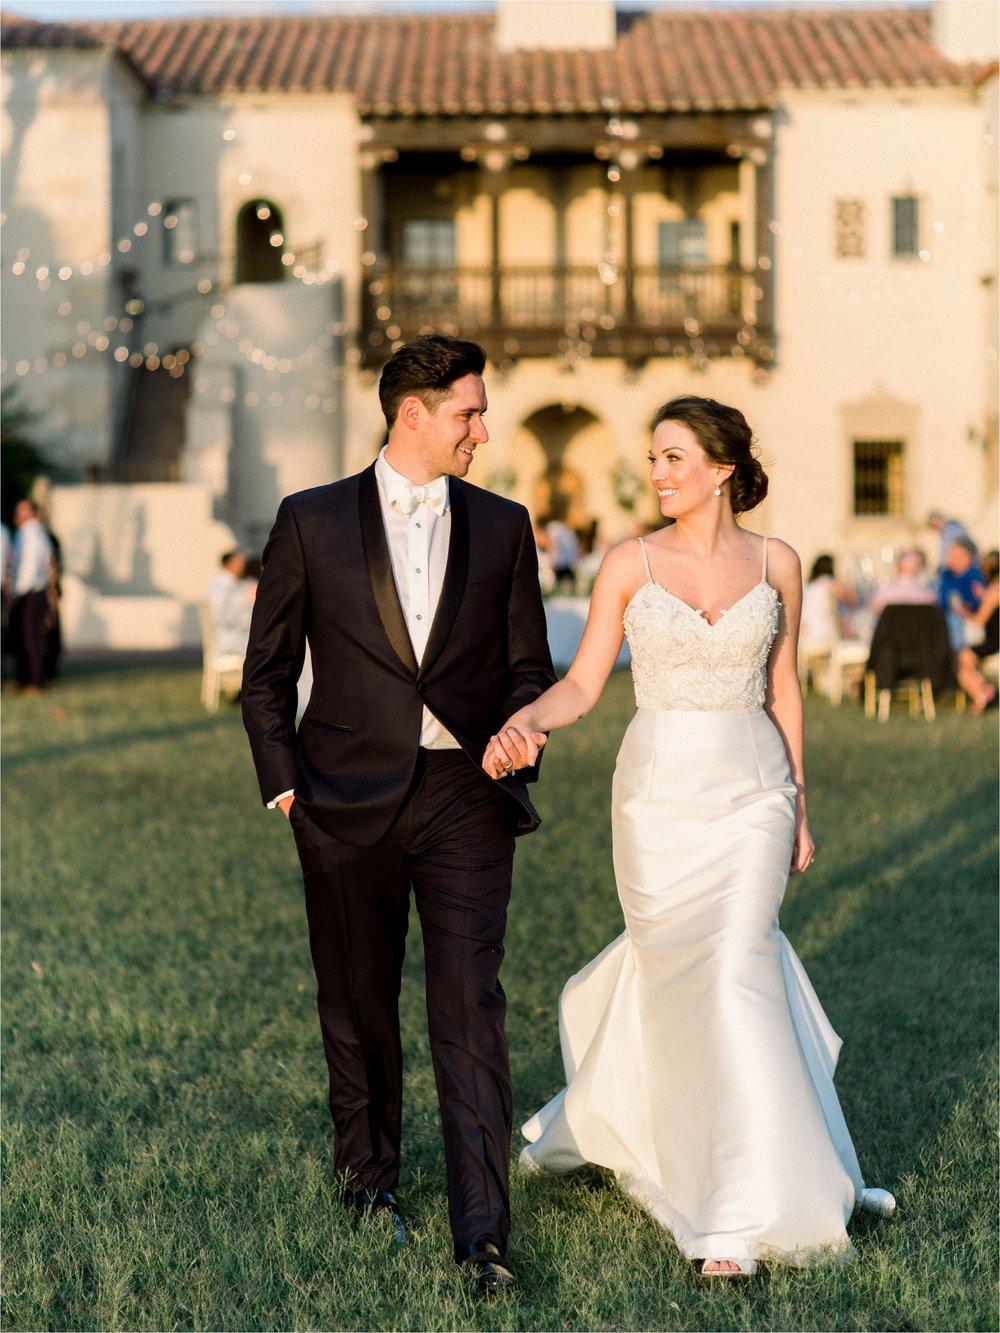 Powel_Crosley_Estate_wedding2543.JPG